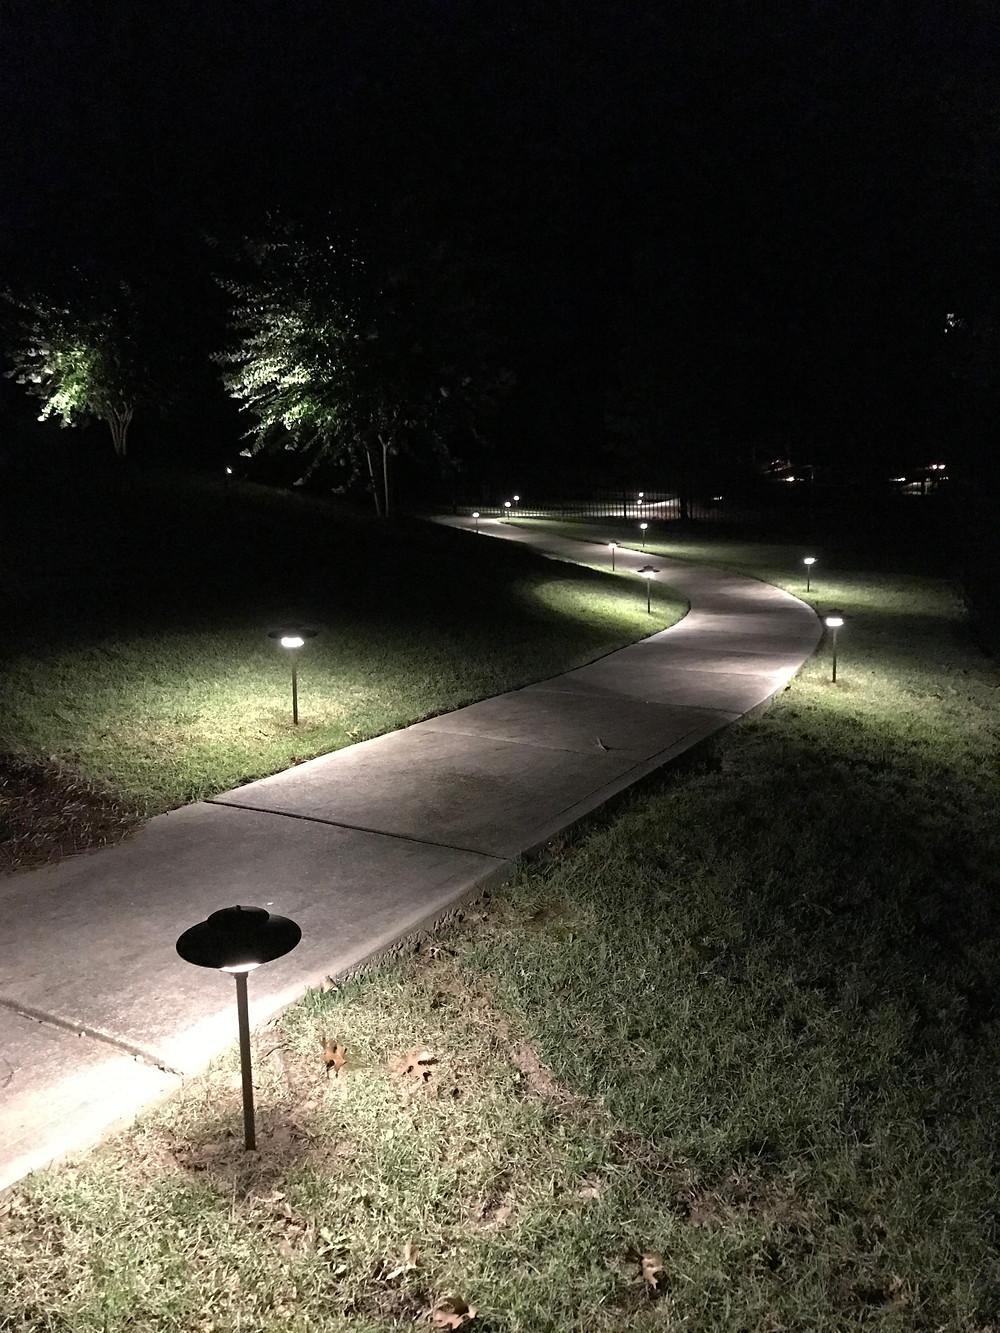 outdoor lighting at night